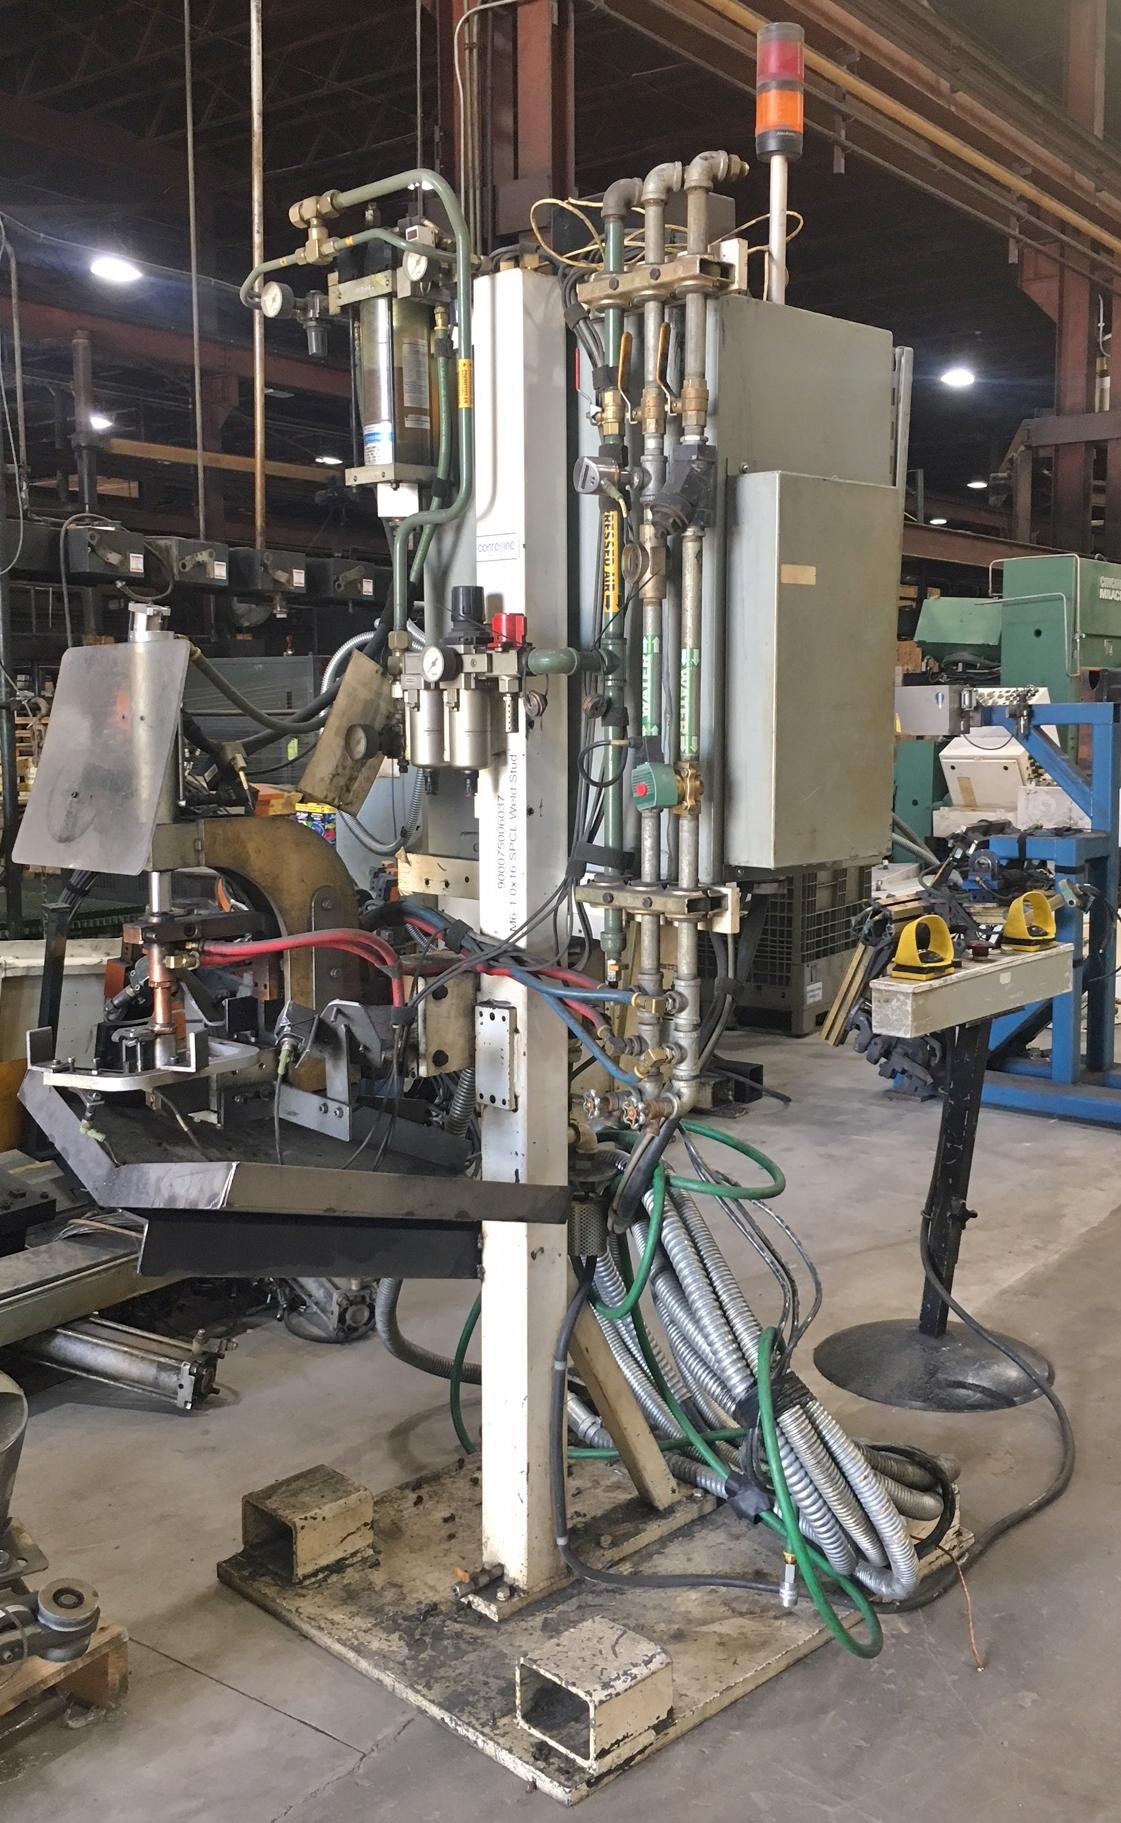 Lot 25 - Centerline 100 kVA Projection Welder